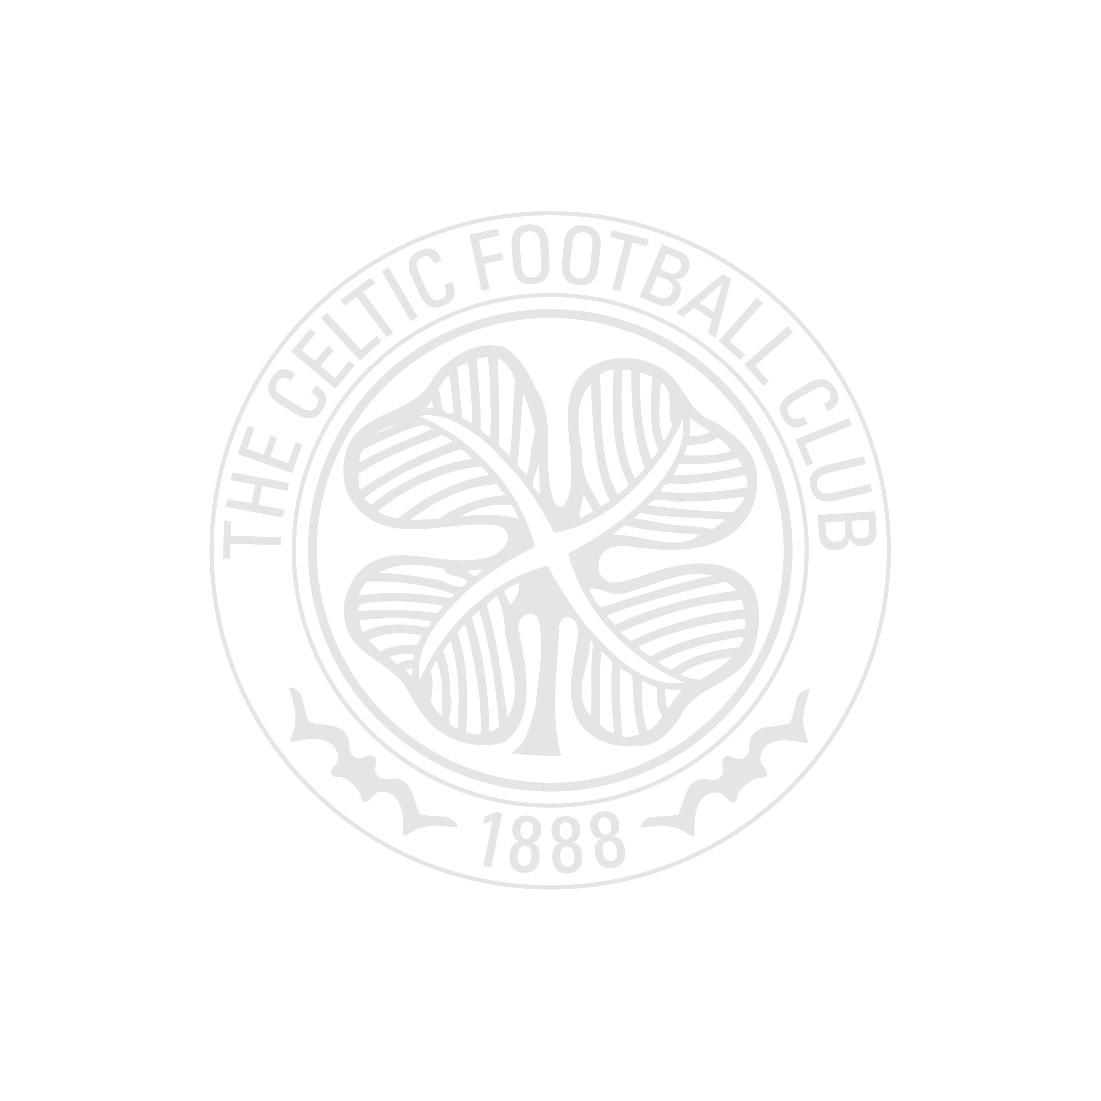 Celtic Moussa Dembele Mug with Signature